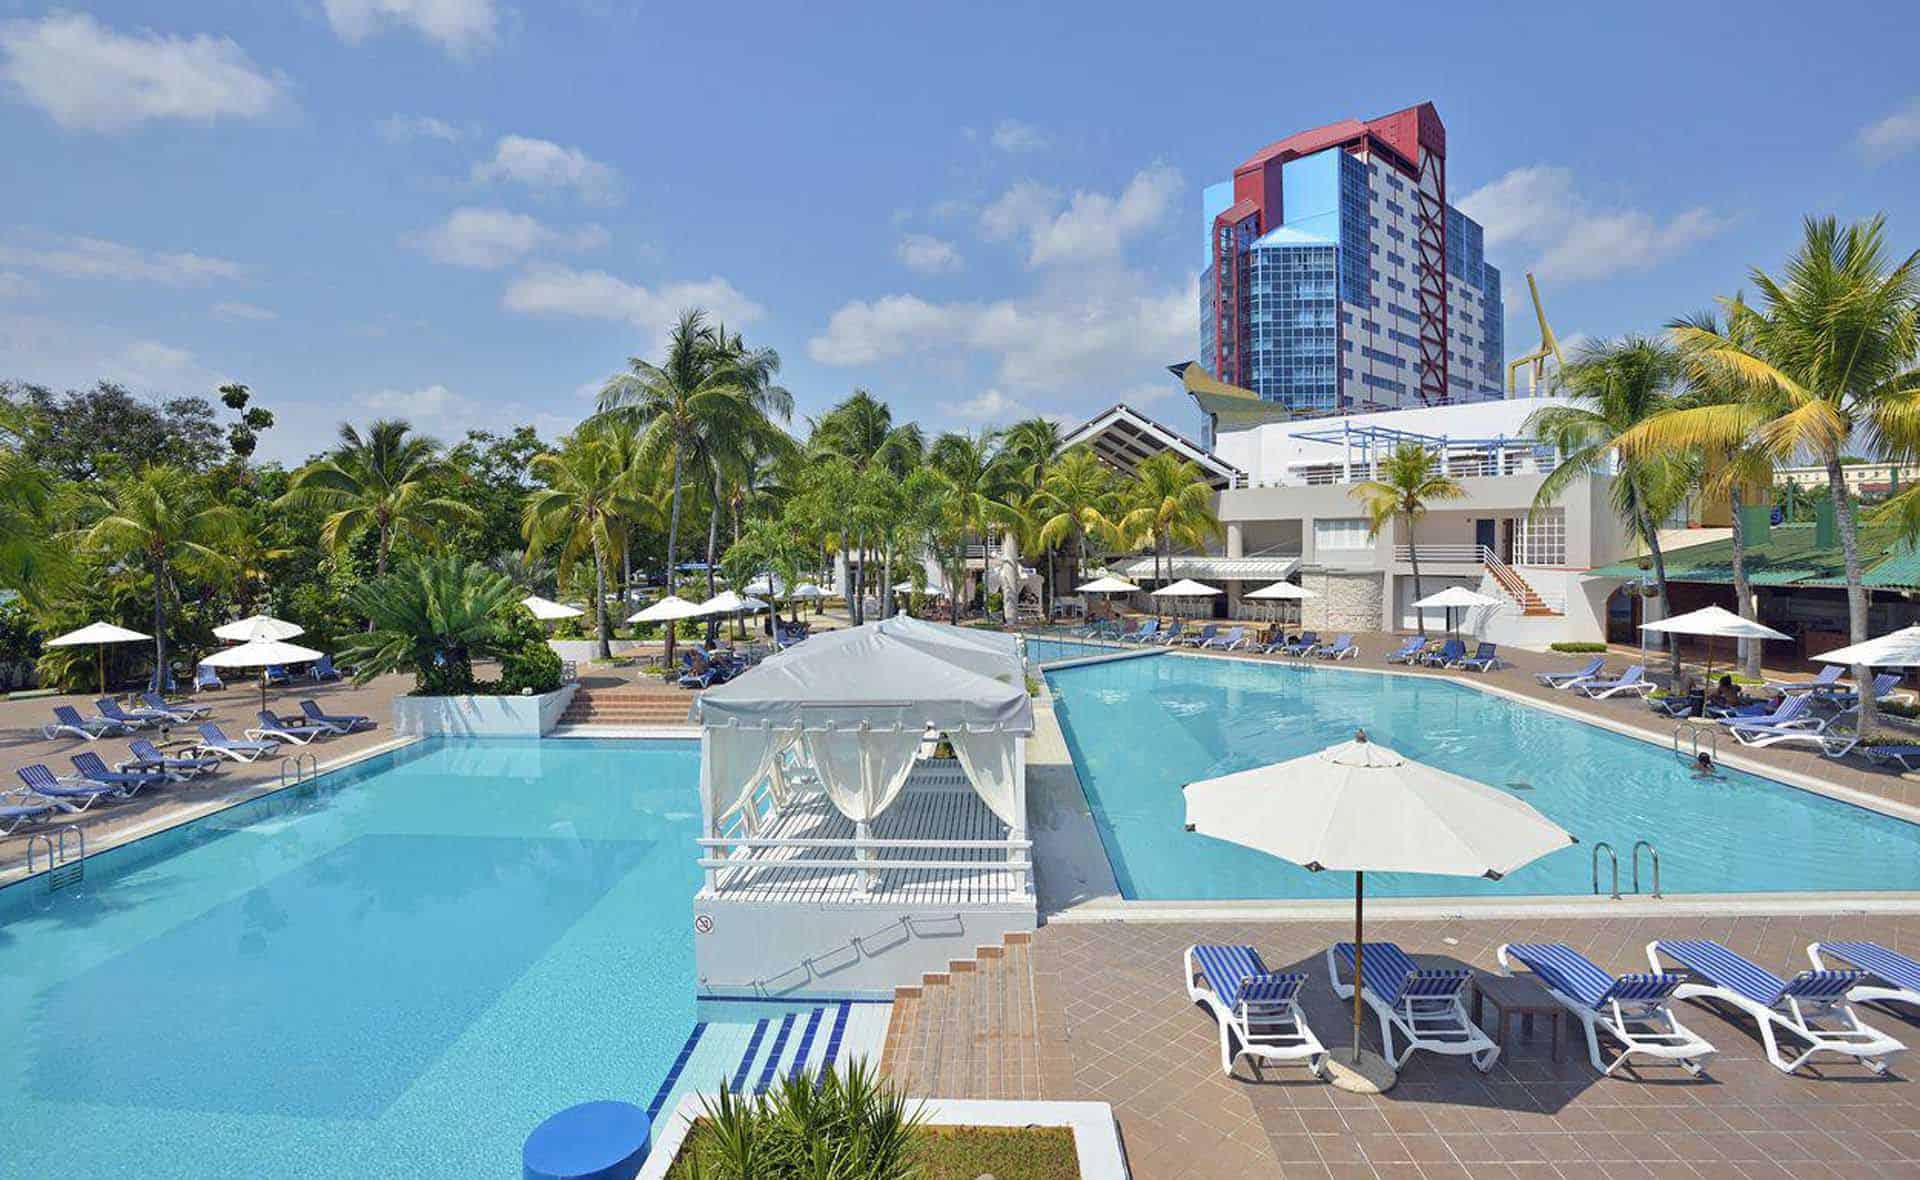 H1630 Hotel Melia Santiago de Cuba